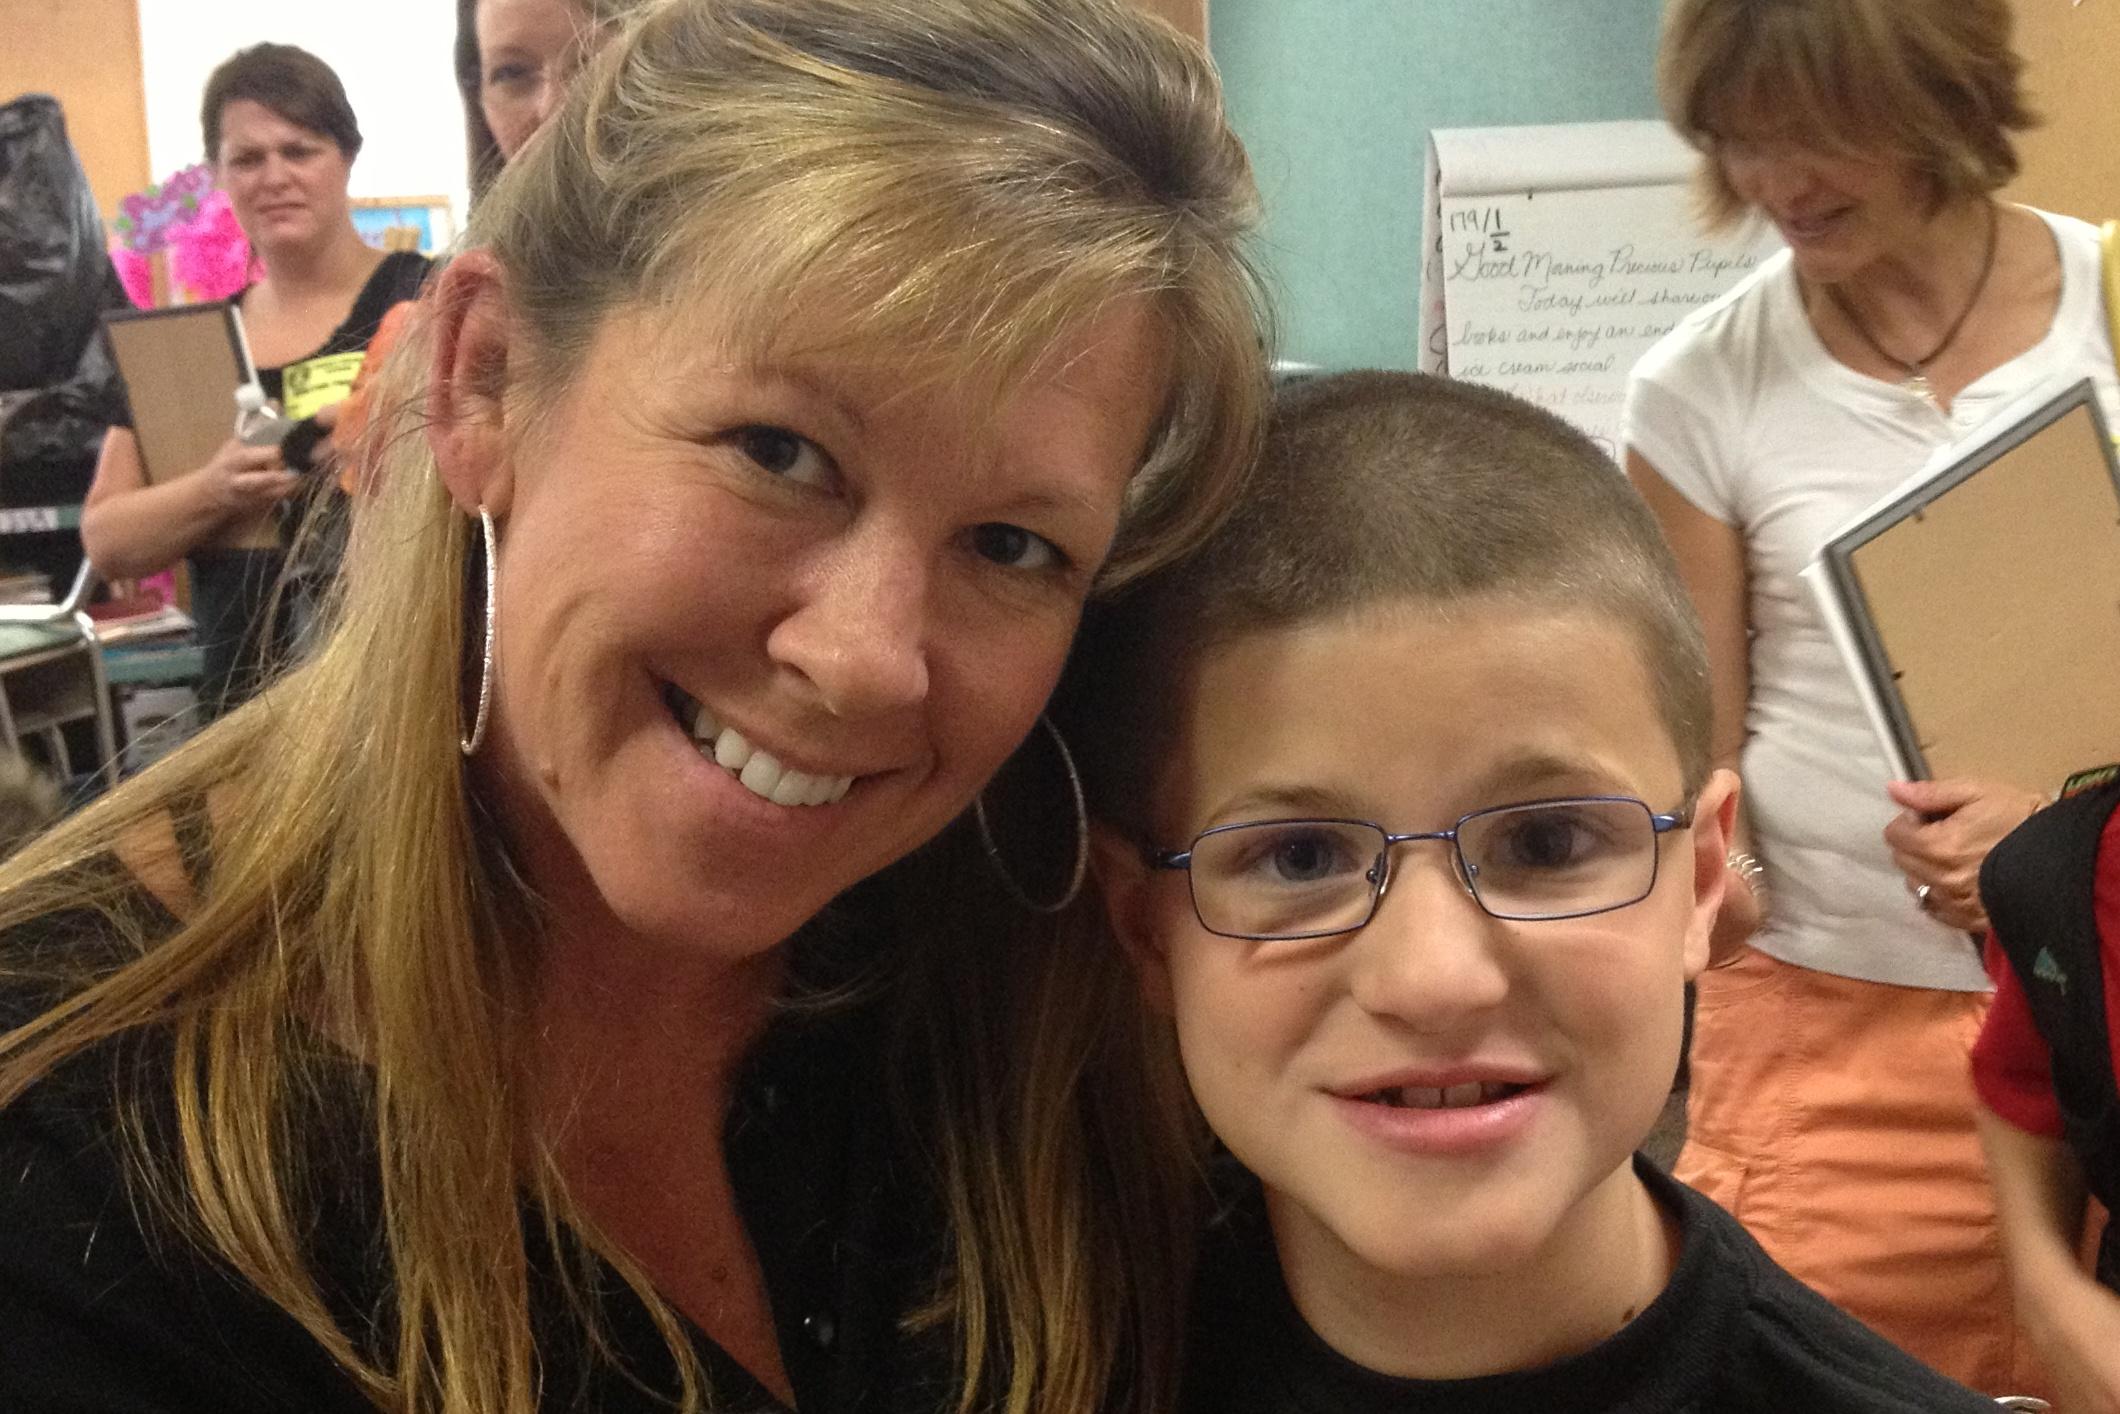 Jack and his third-grade teacher, Mrs. Brennan